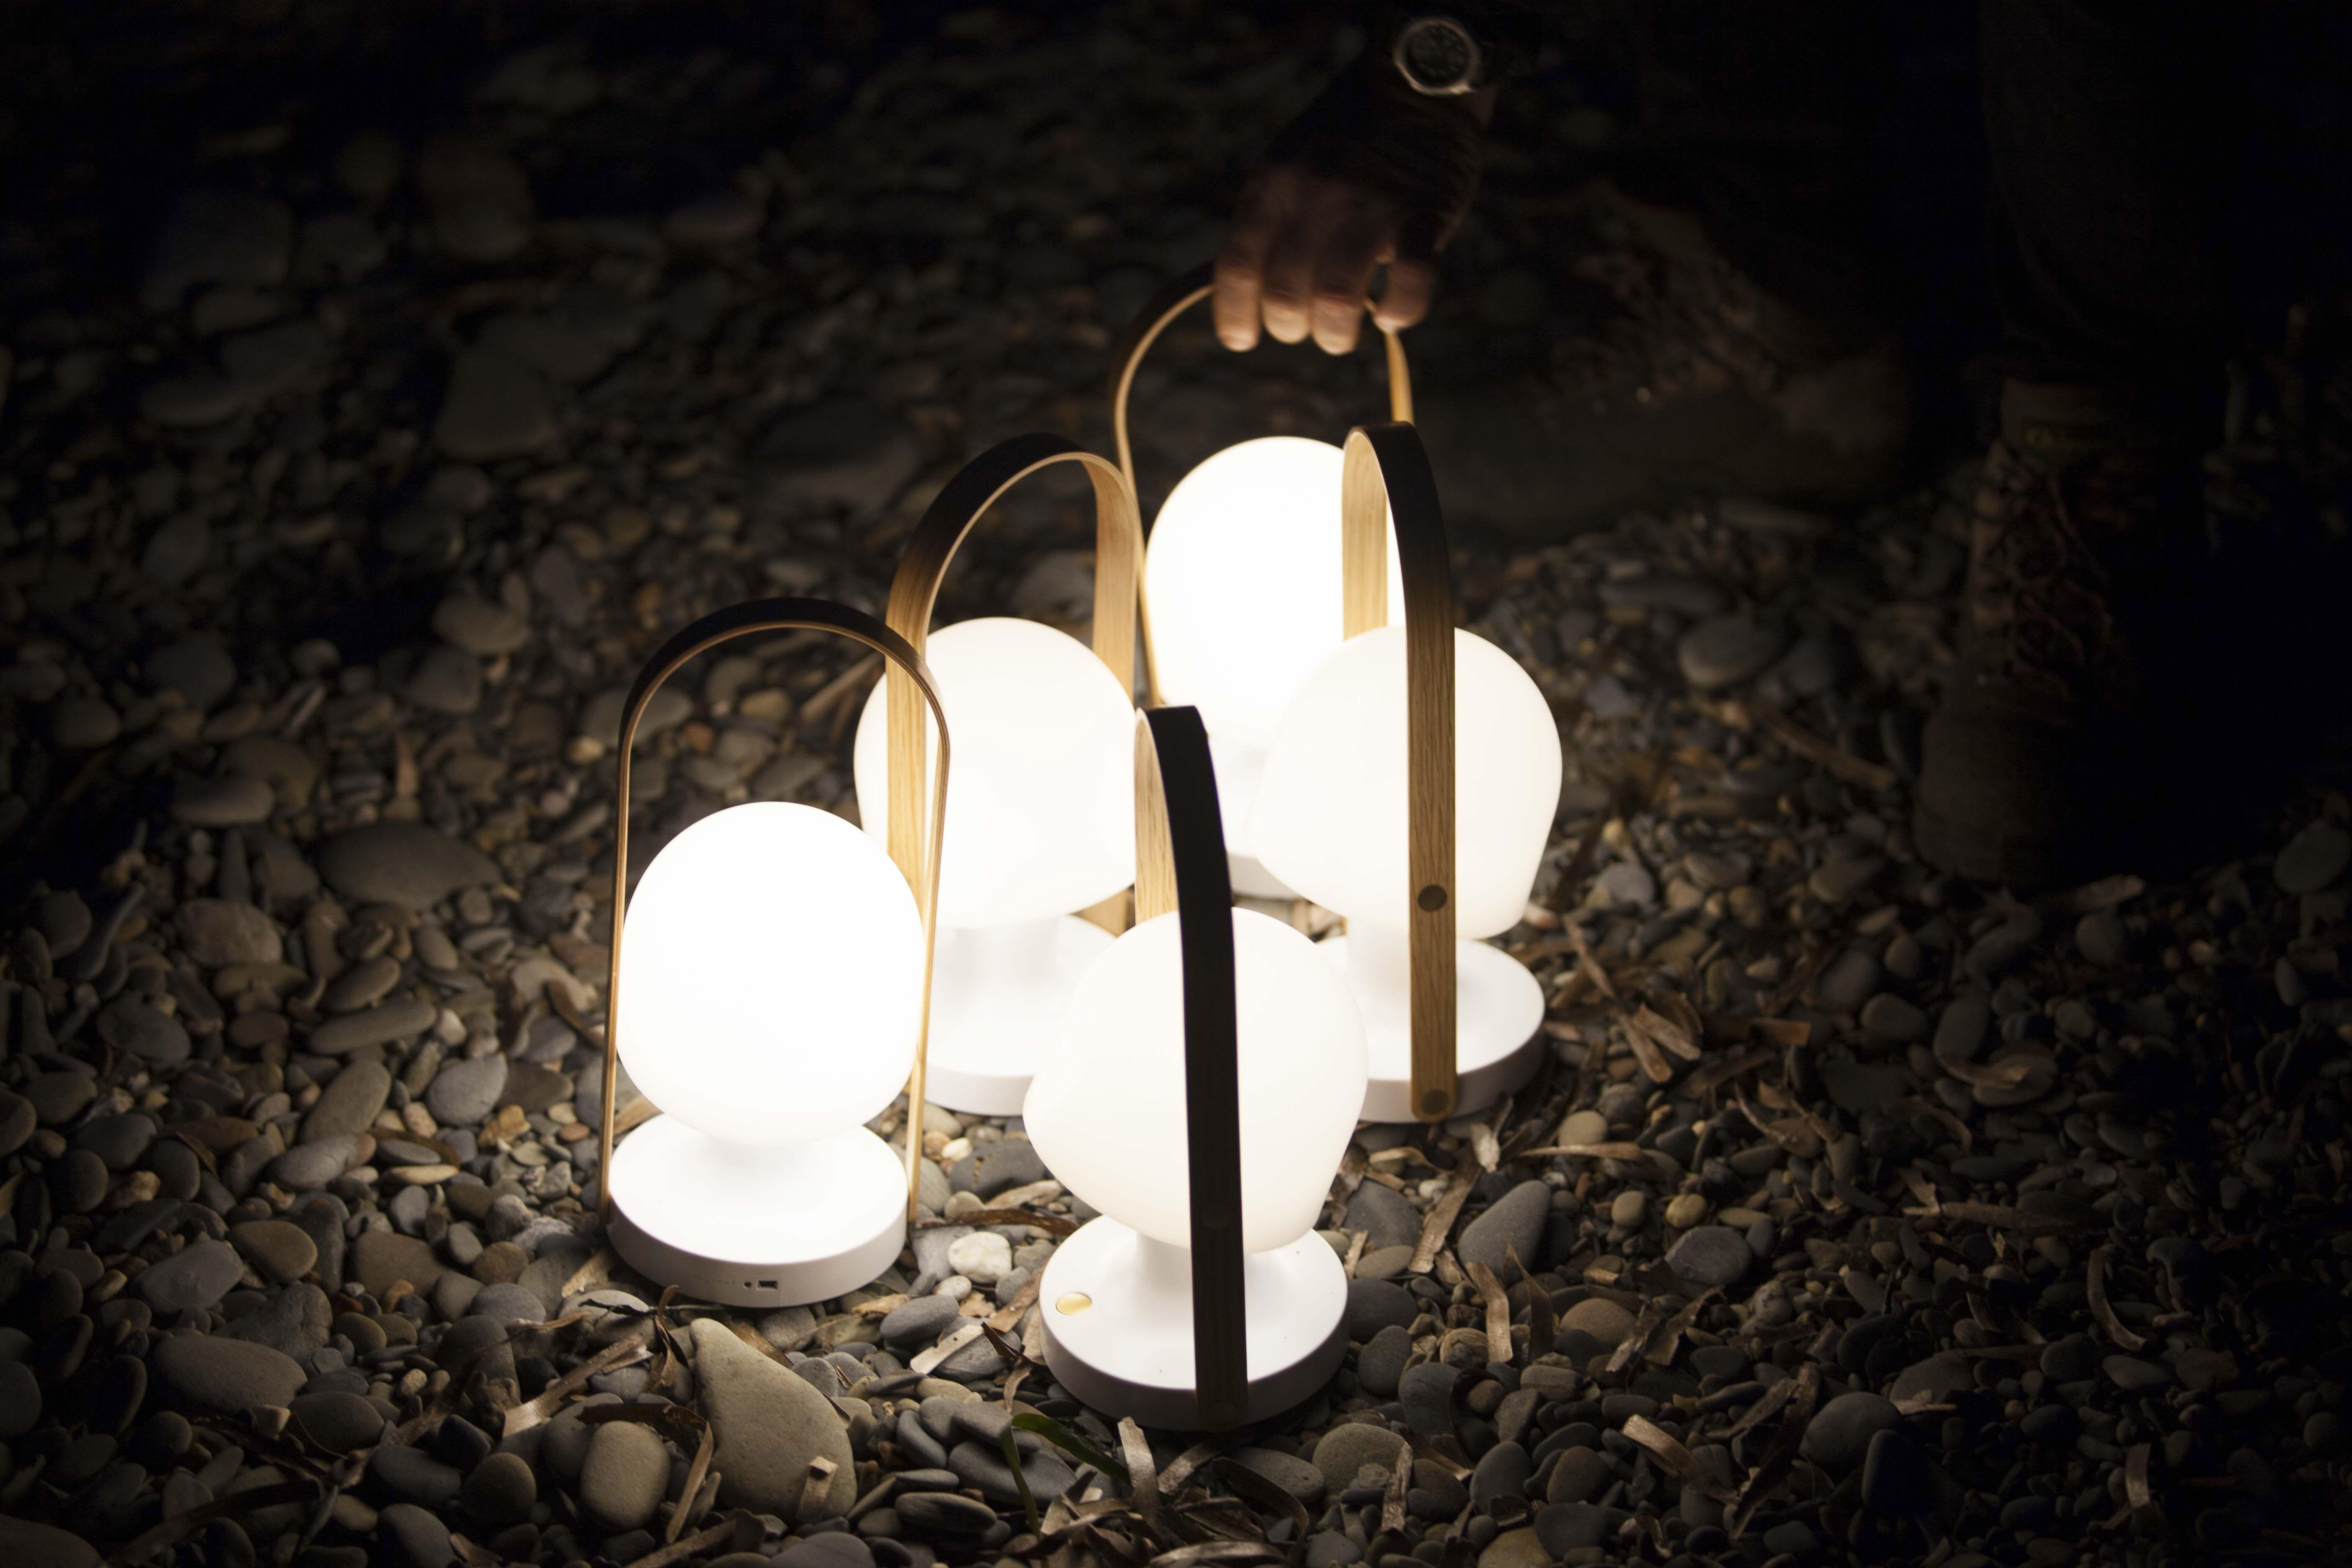 lampe sans fil followme led h 29 cm h 29 cm blanc bois marset. Black Bedroom Furniture Sets. Home Design Ideas